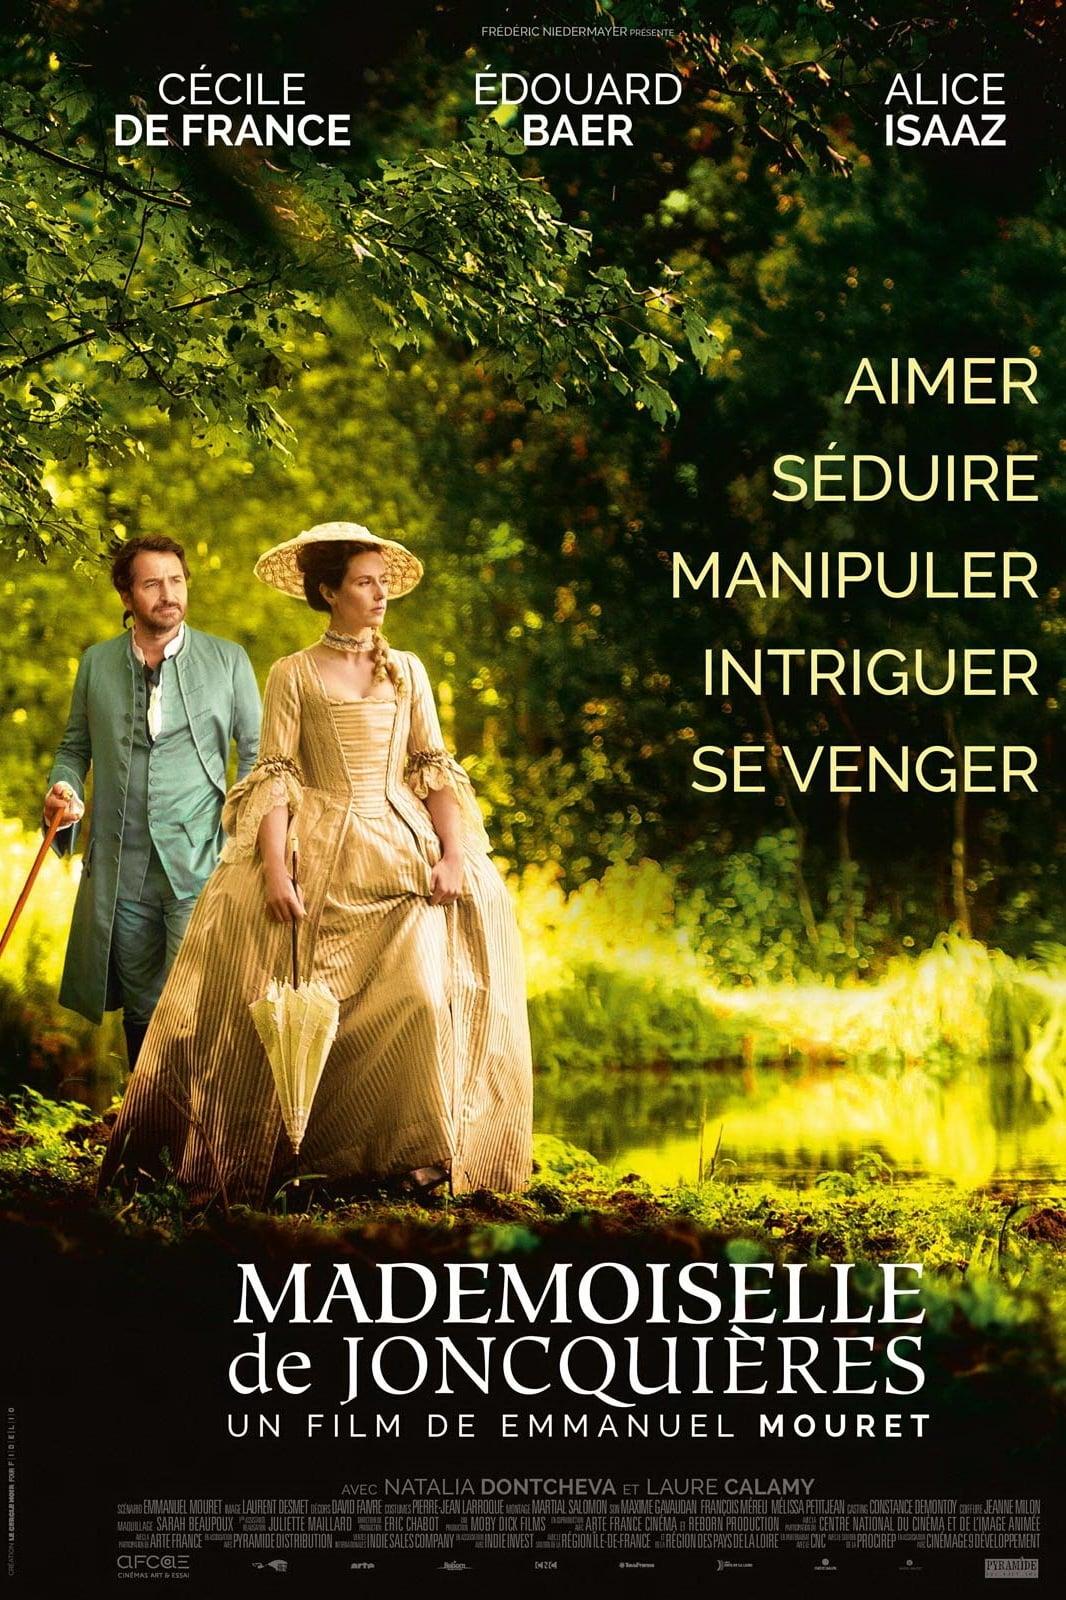 Mademoiselle de Joncquières streaming sur libertyvf